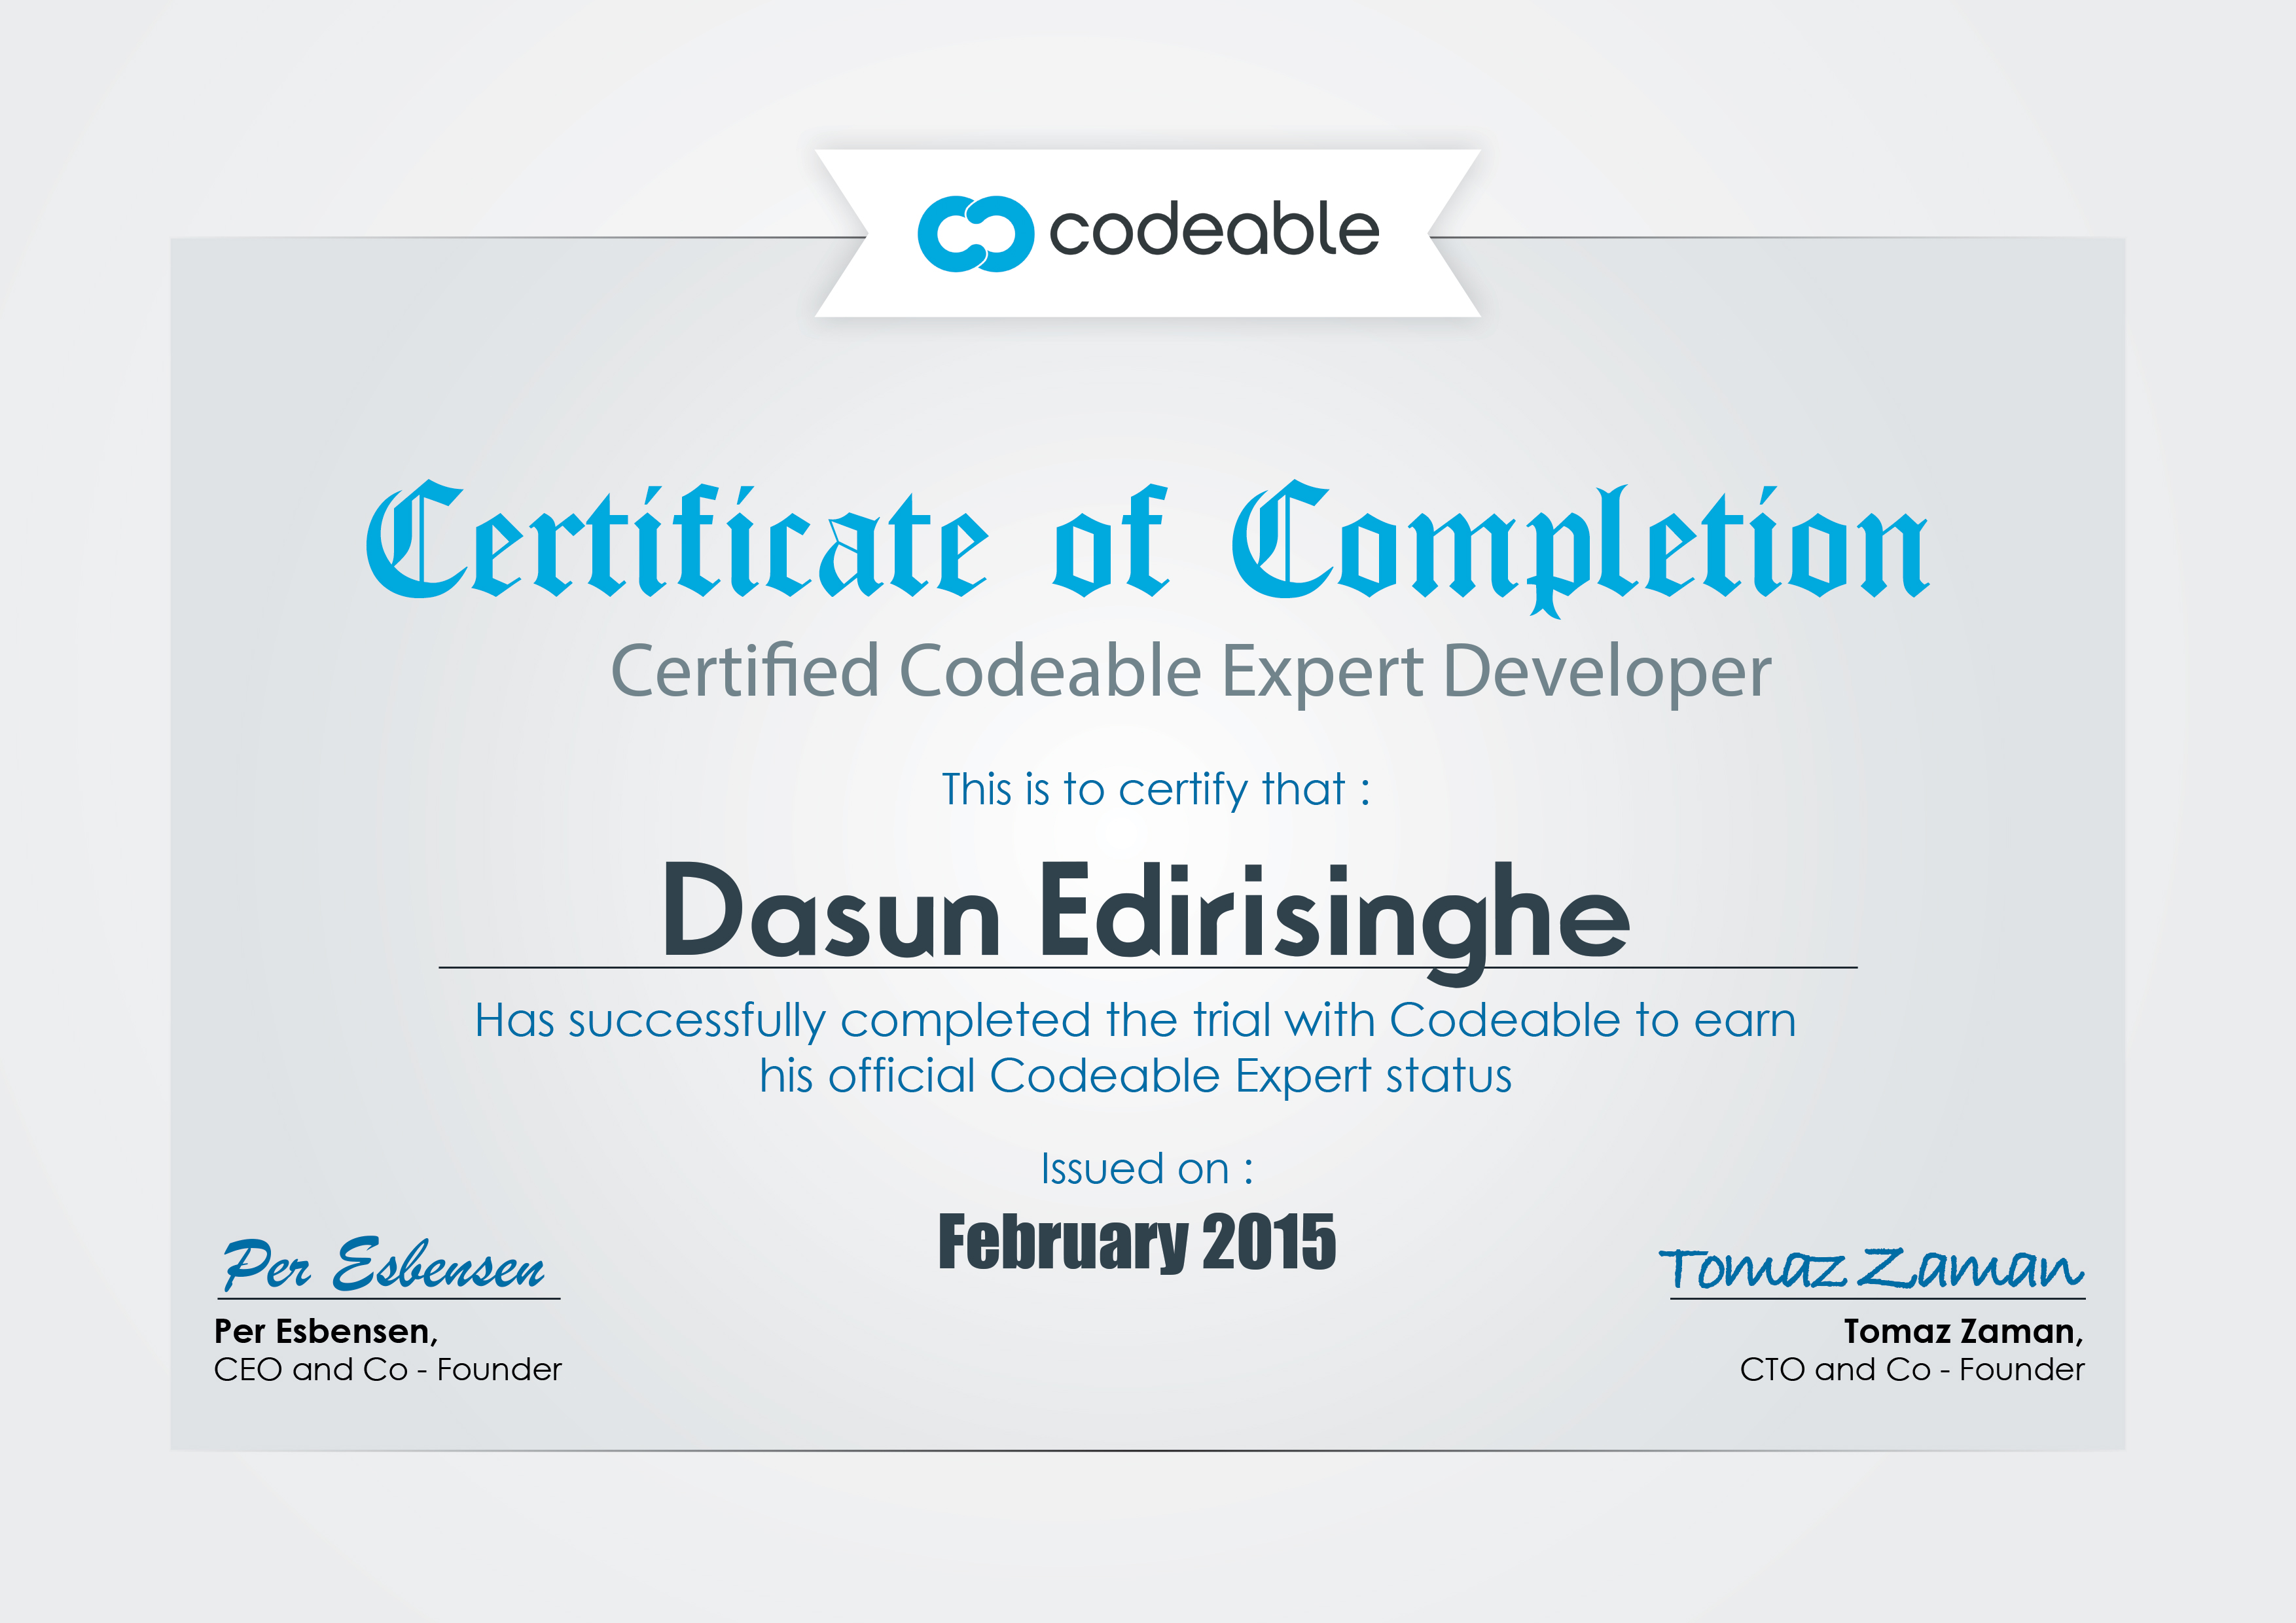 Codeable Expert Dasun